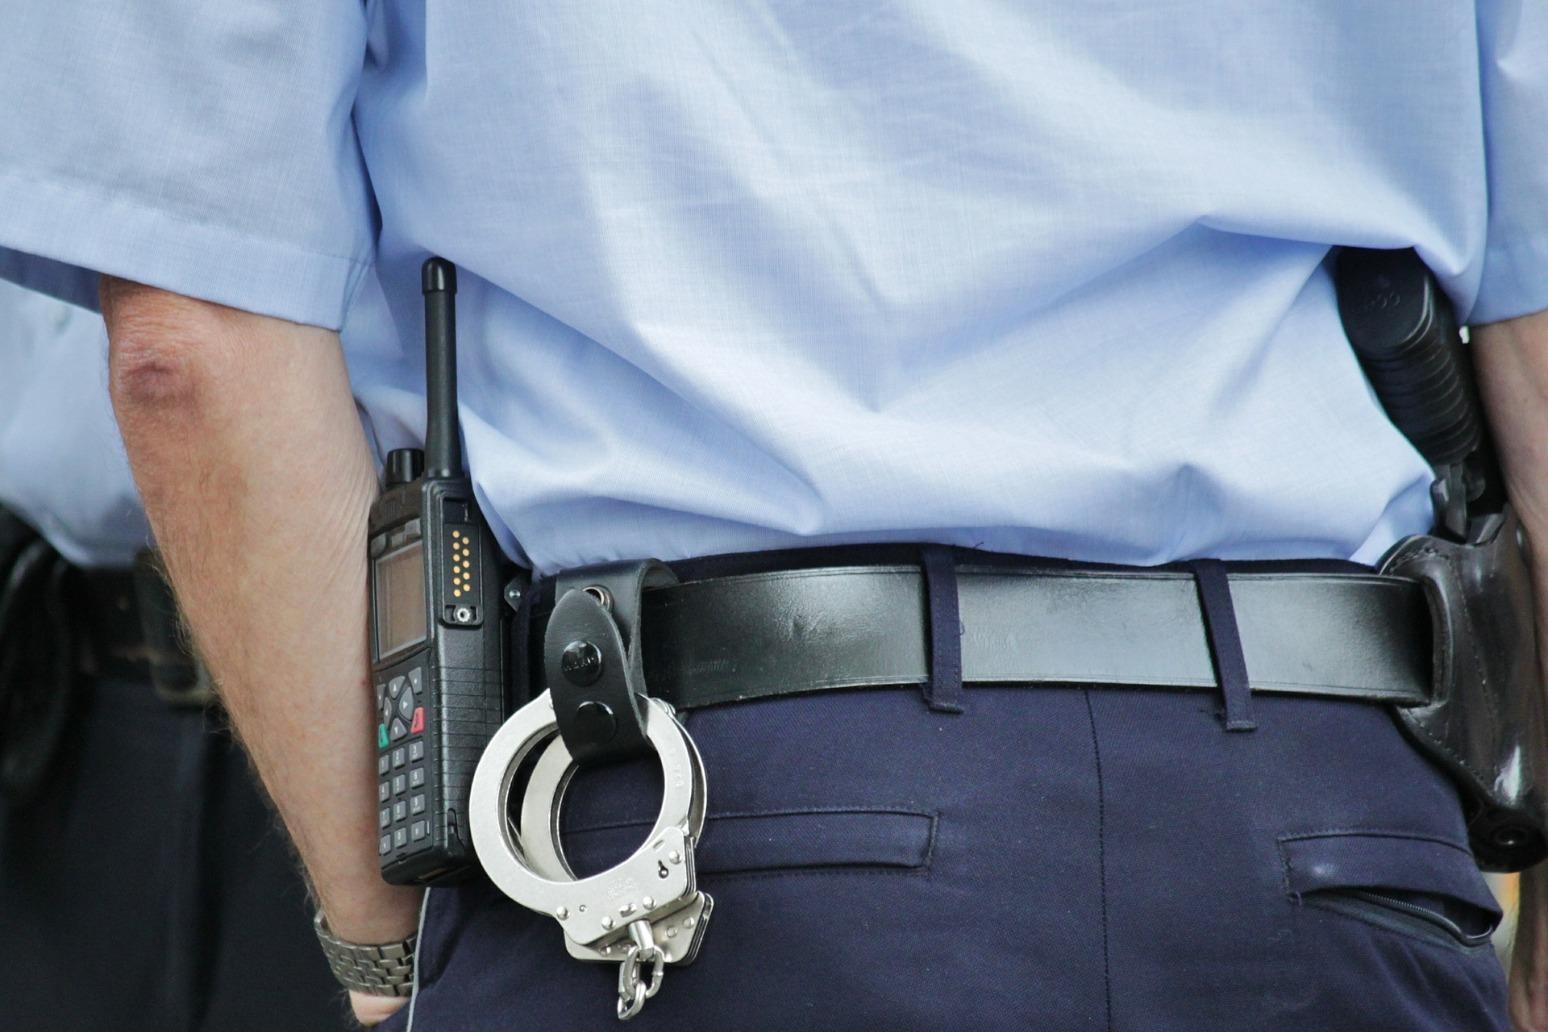 Atlanta police officer sacked after fatal shooting of black man